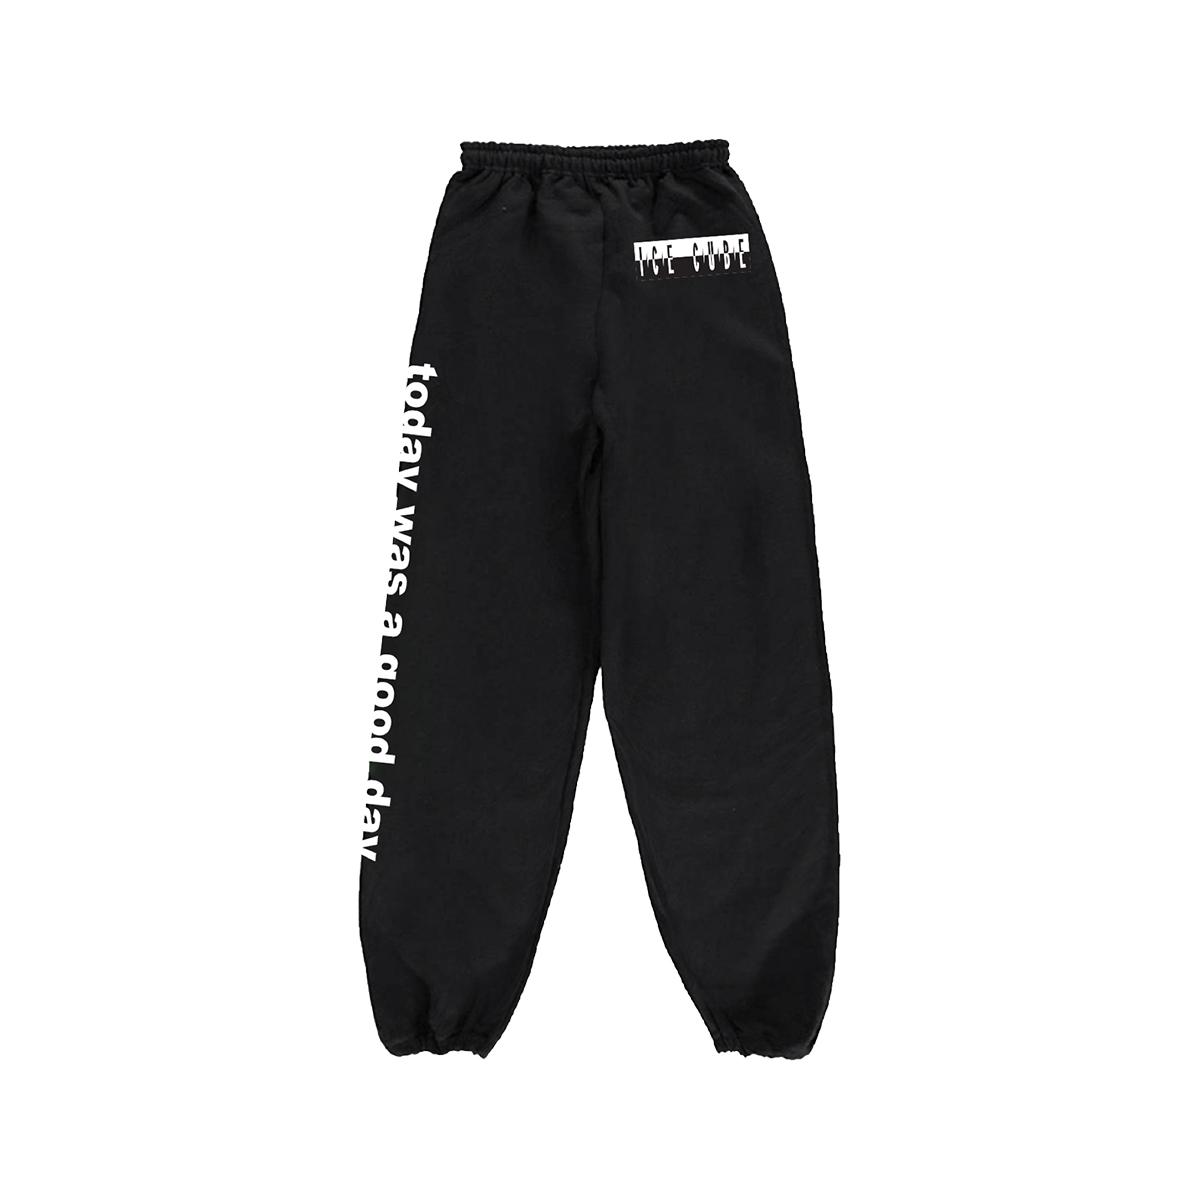 Good Day Black Sweatpants